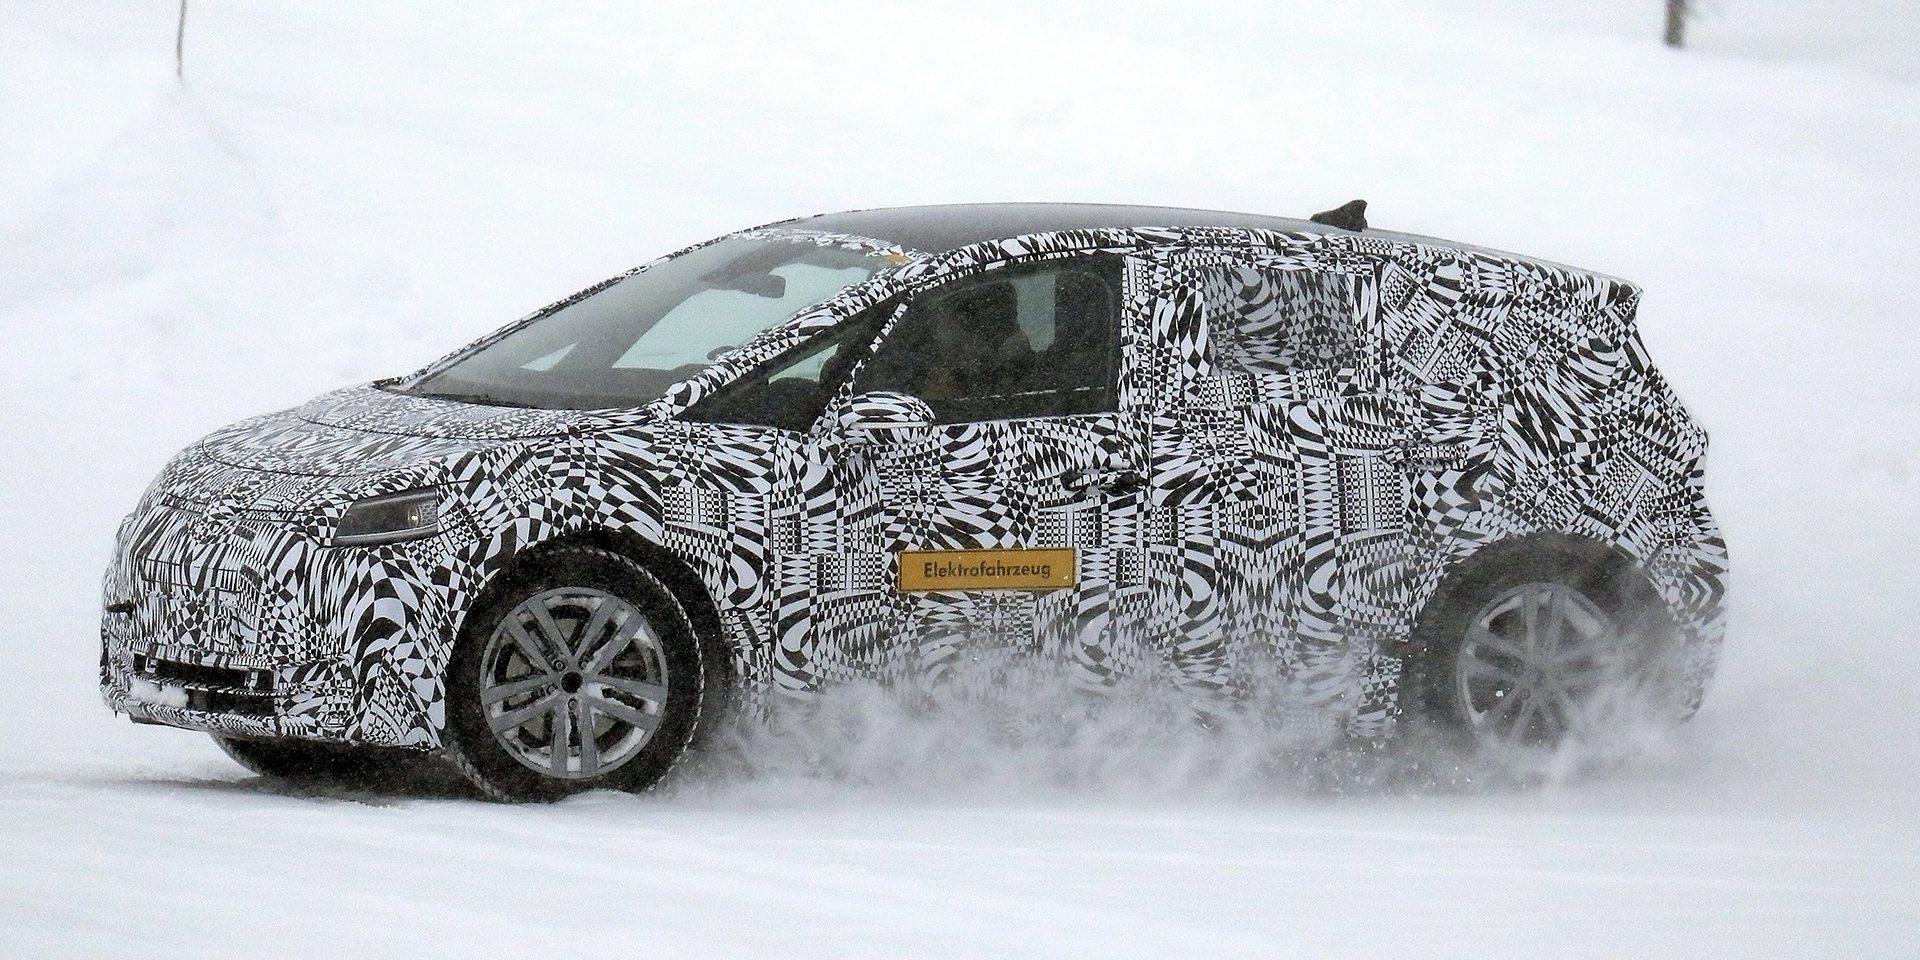 Volkswagen continua os ensaios de desenvolvimento do ID que será lançado ainda este ano